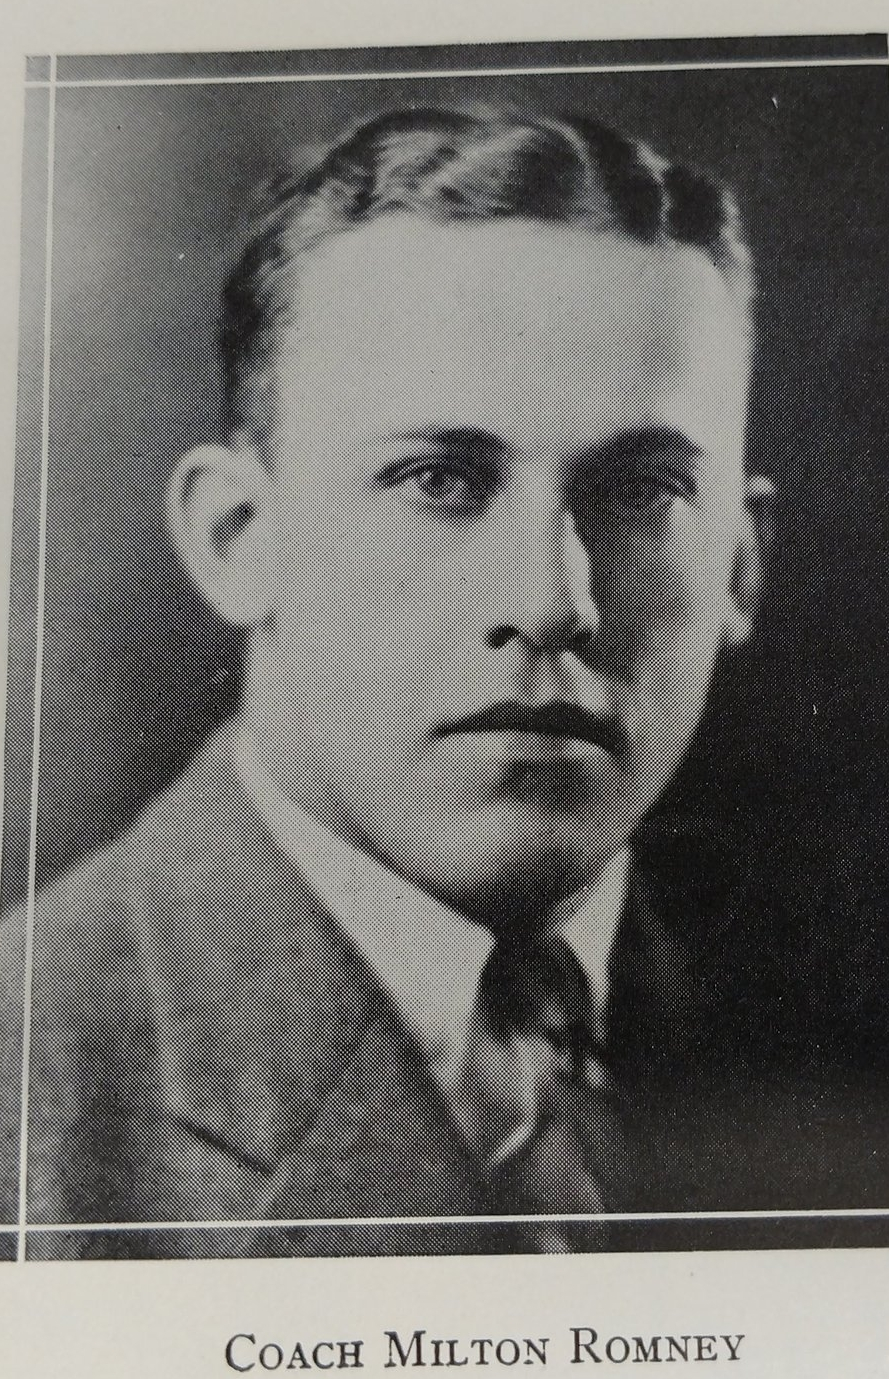 Coach Romney 1923.jpg